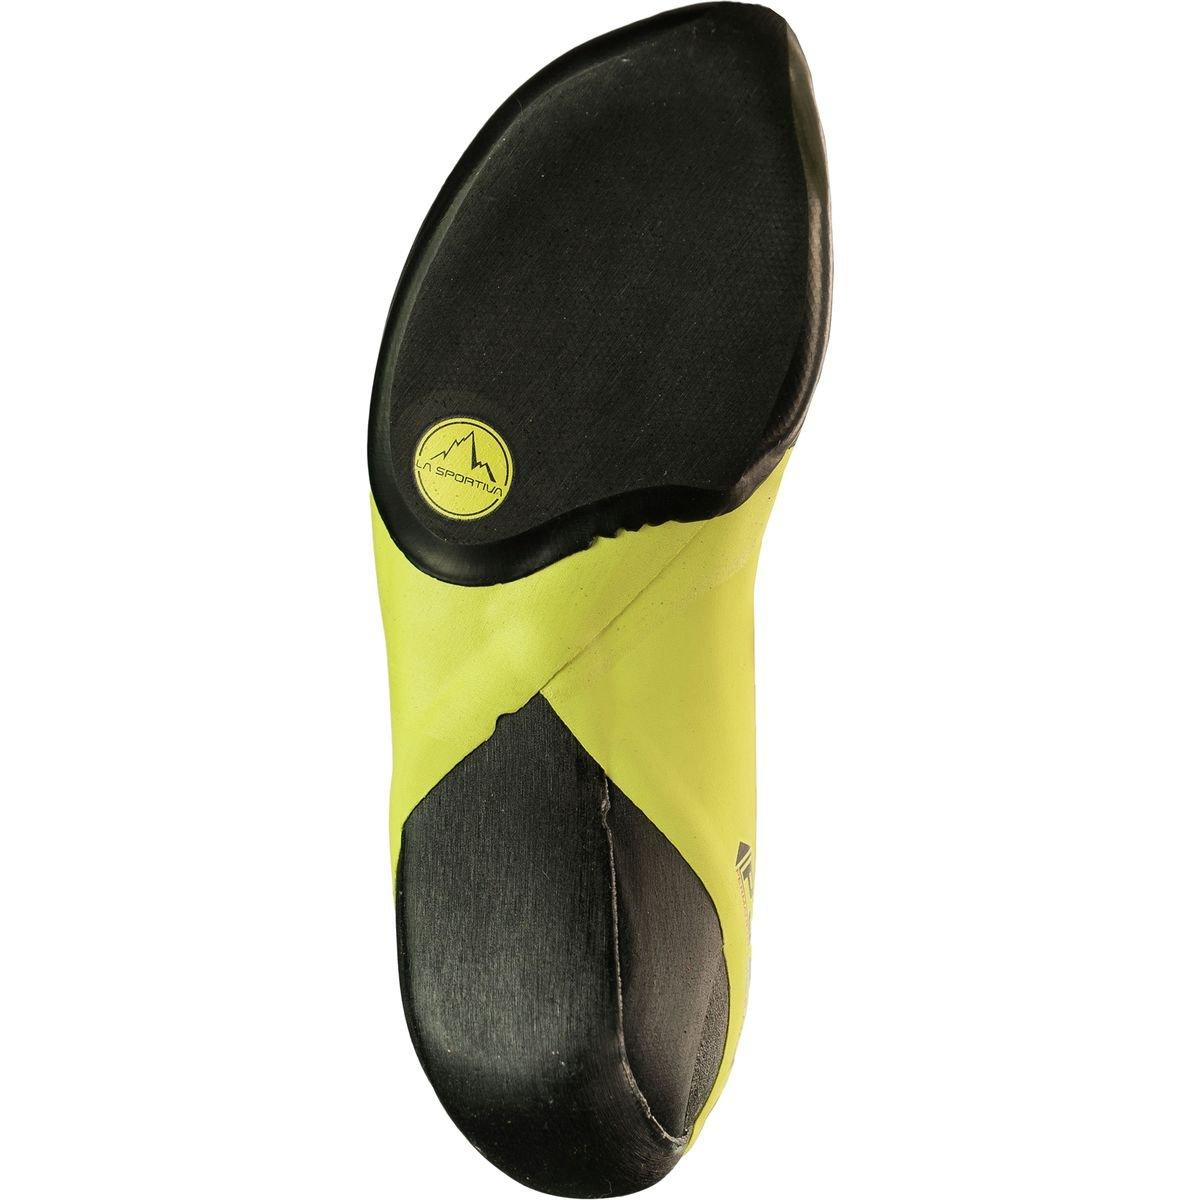 La Sportiva Maverink Climbing Shoe - Men's B01K7UXMSY 32 (US Men's 1) D - Medium|Flame/Sulphur